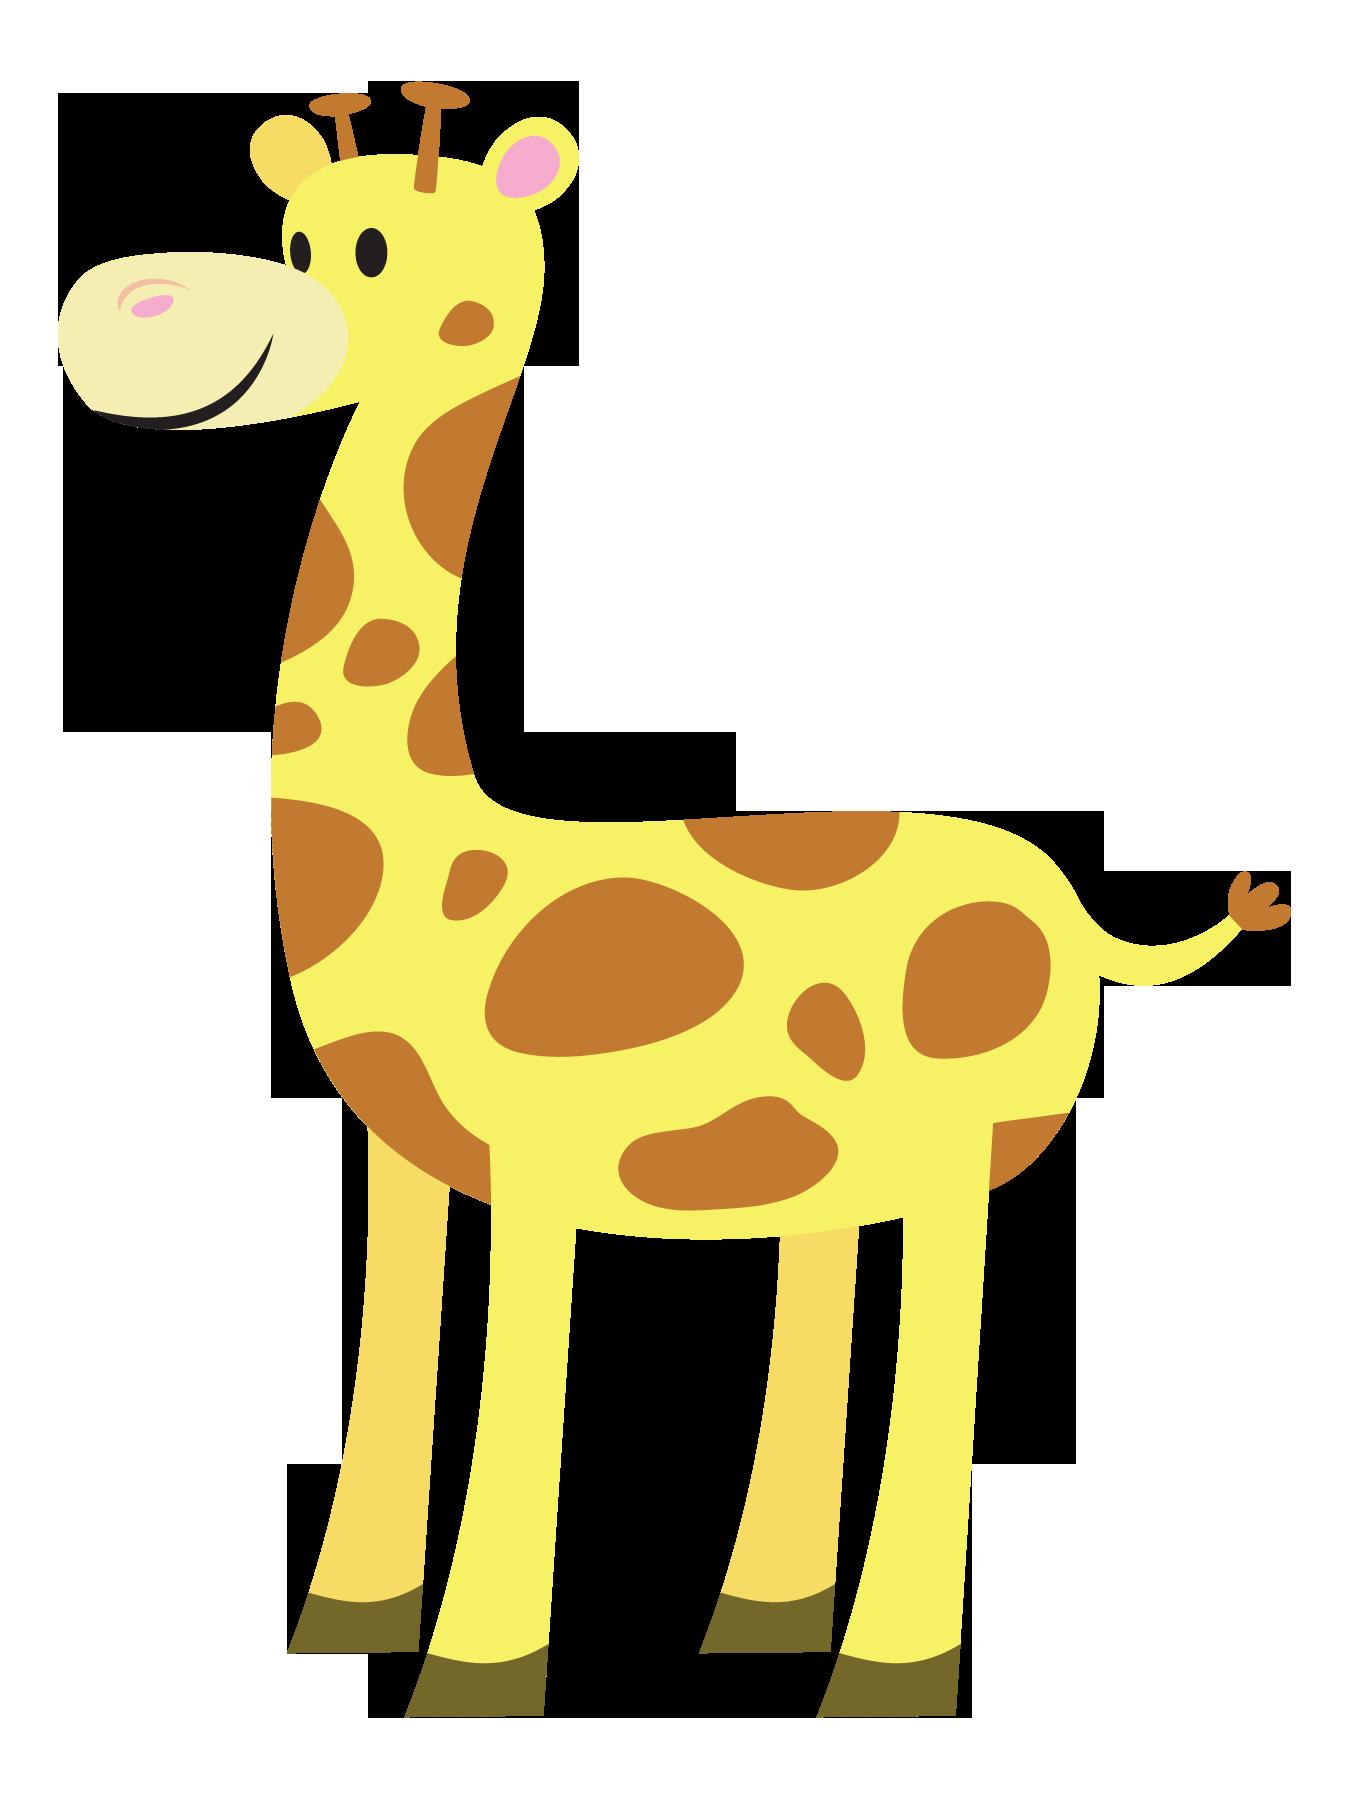 Baby Giraffe Clipart Clipart Panda Free -Baby Giraffe Clipart Clipart Panda Free Clipart Images-5